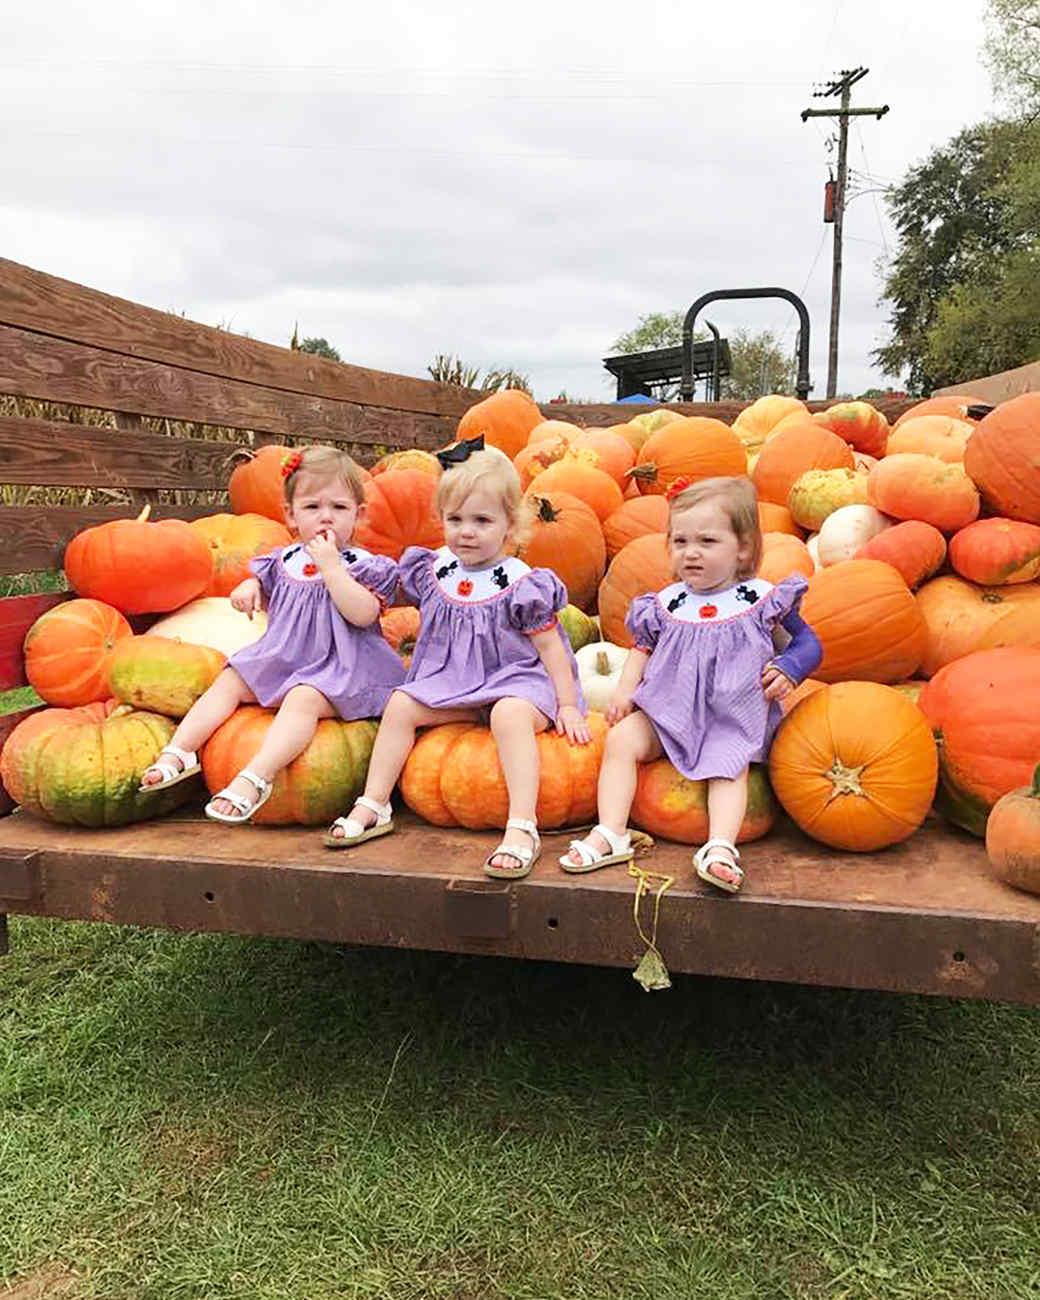 Kids Sitting on a Pumpkin Truck